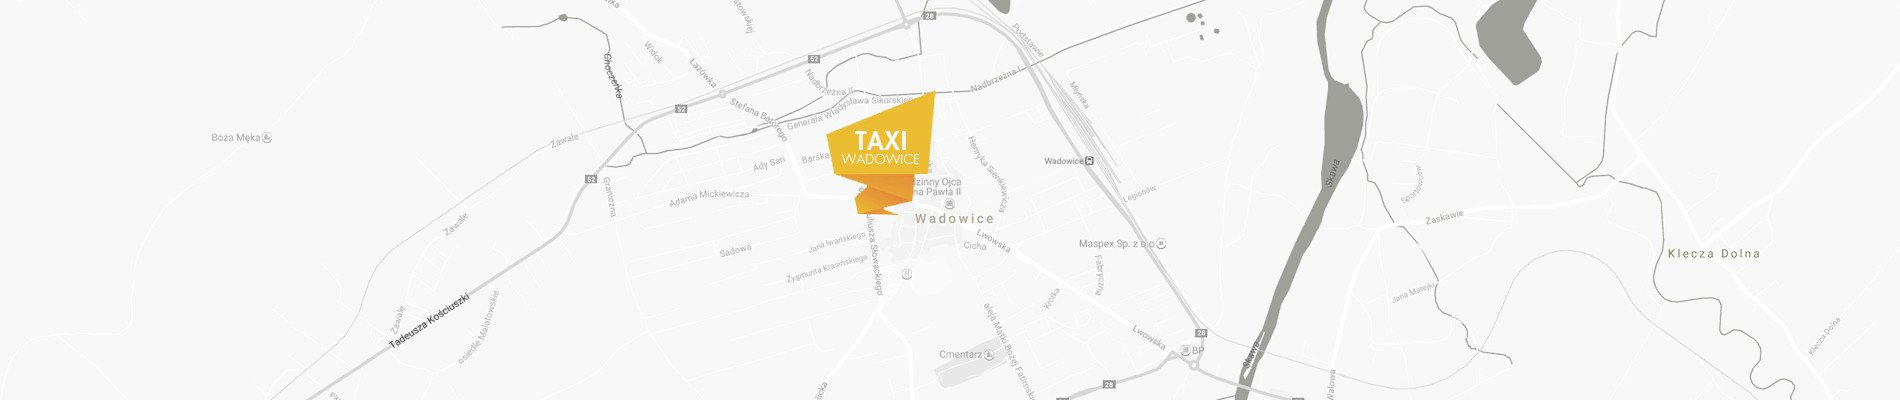 taxi wadowice 604 170 052 mapa